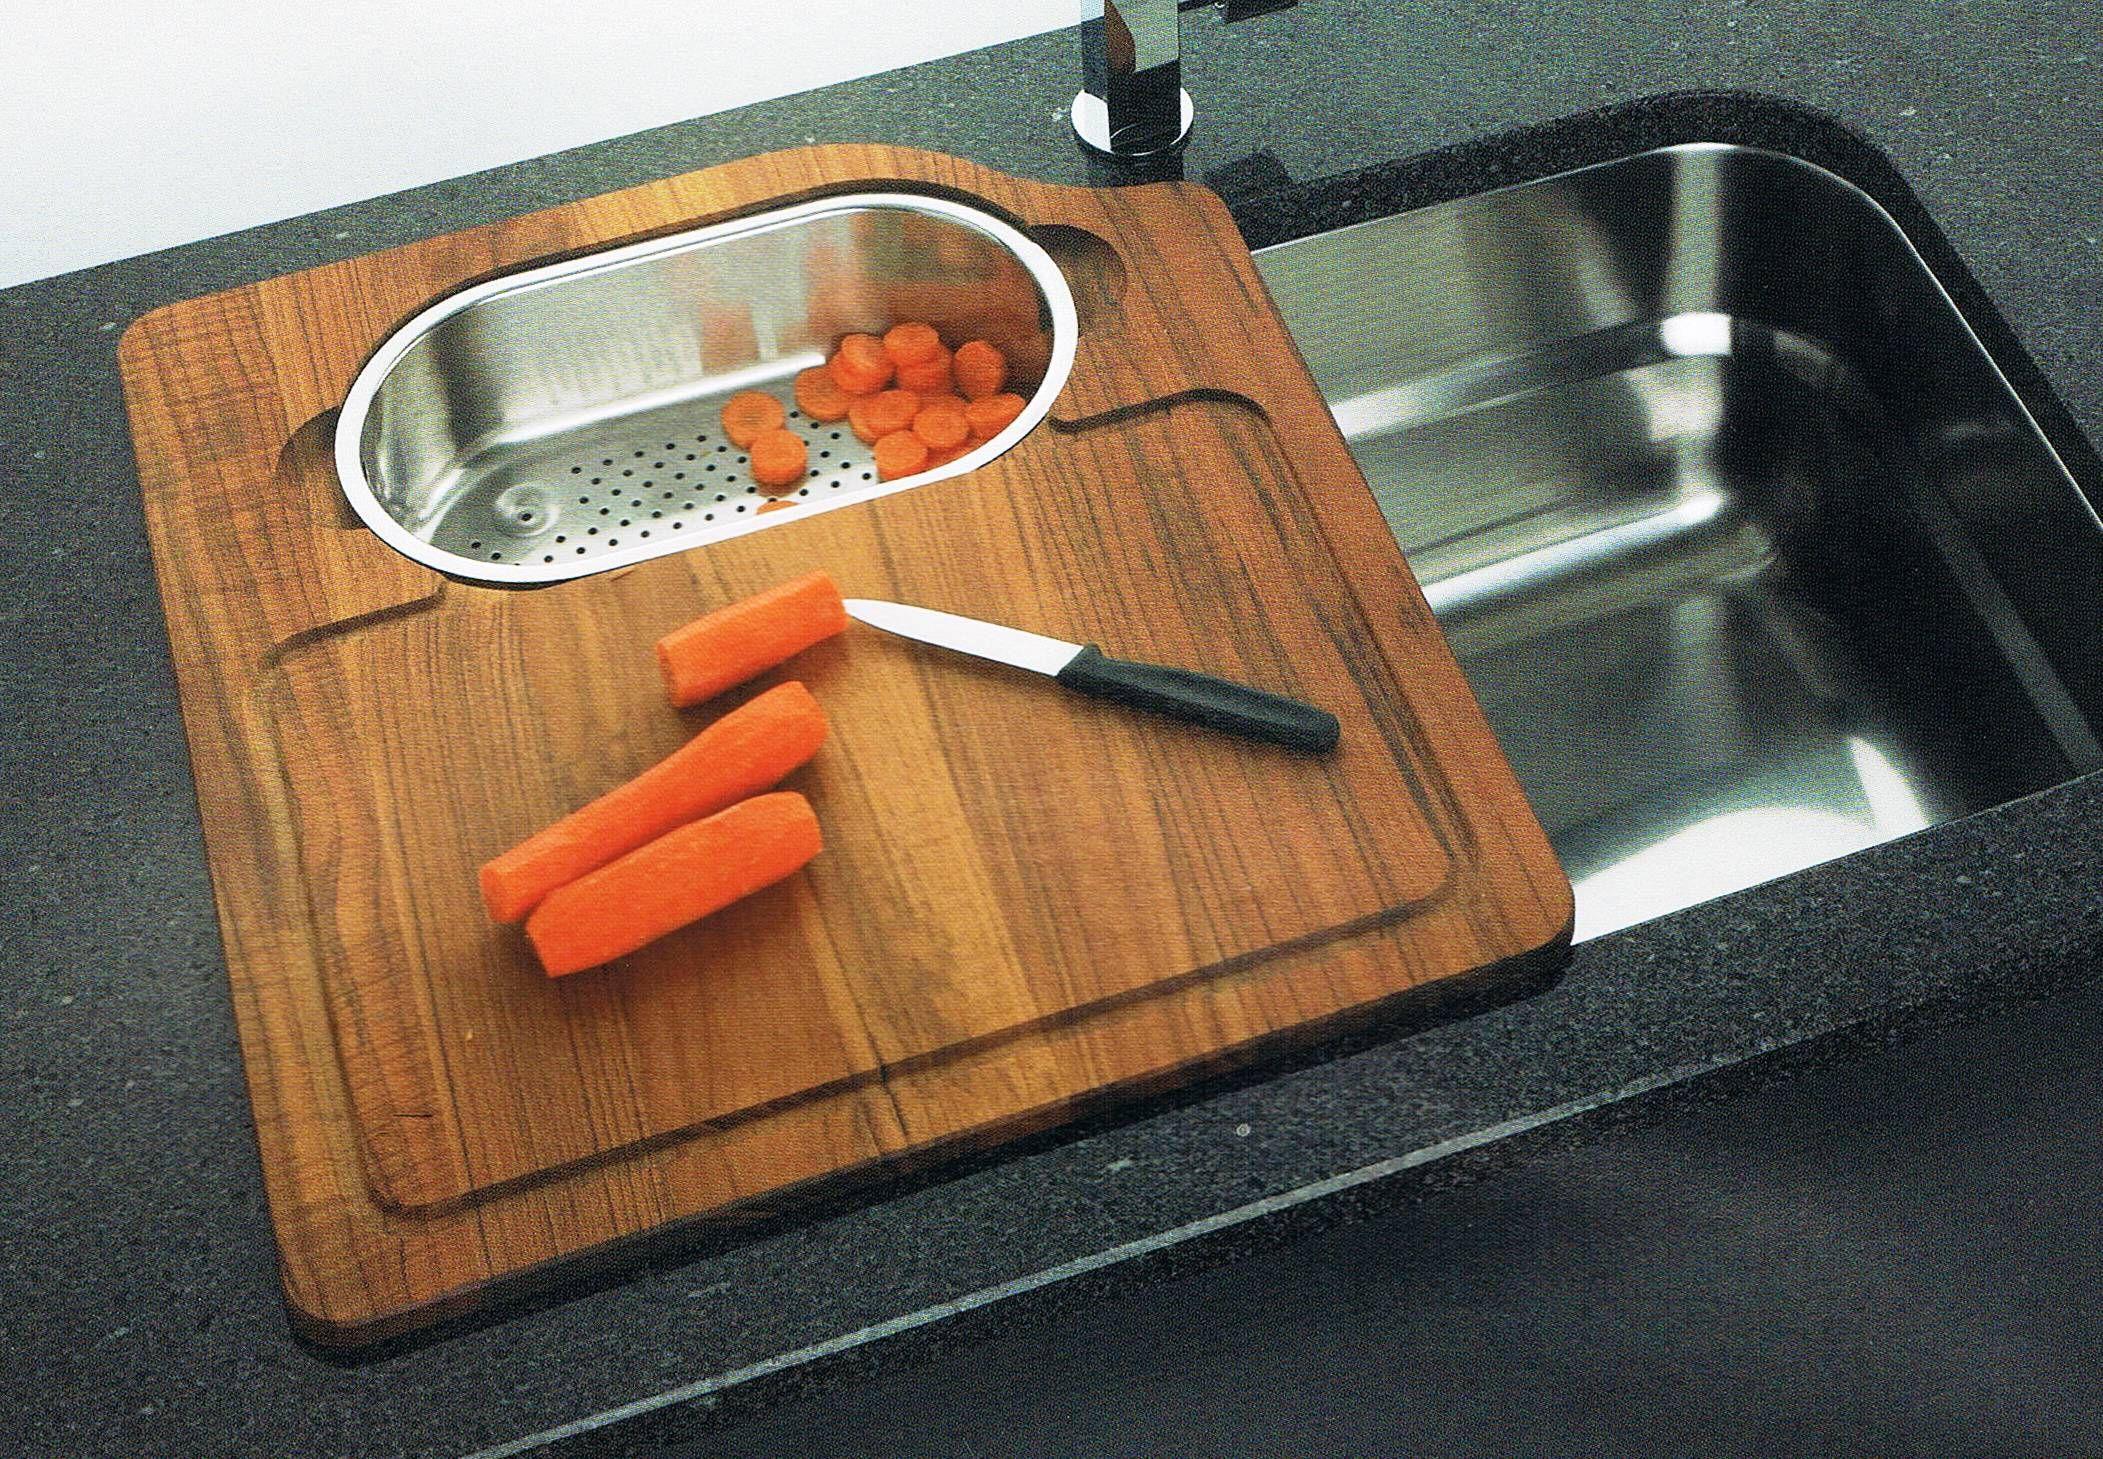 Undermount Stainless Steel Single Bowl Sinks Best Kitchen Sinks